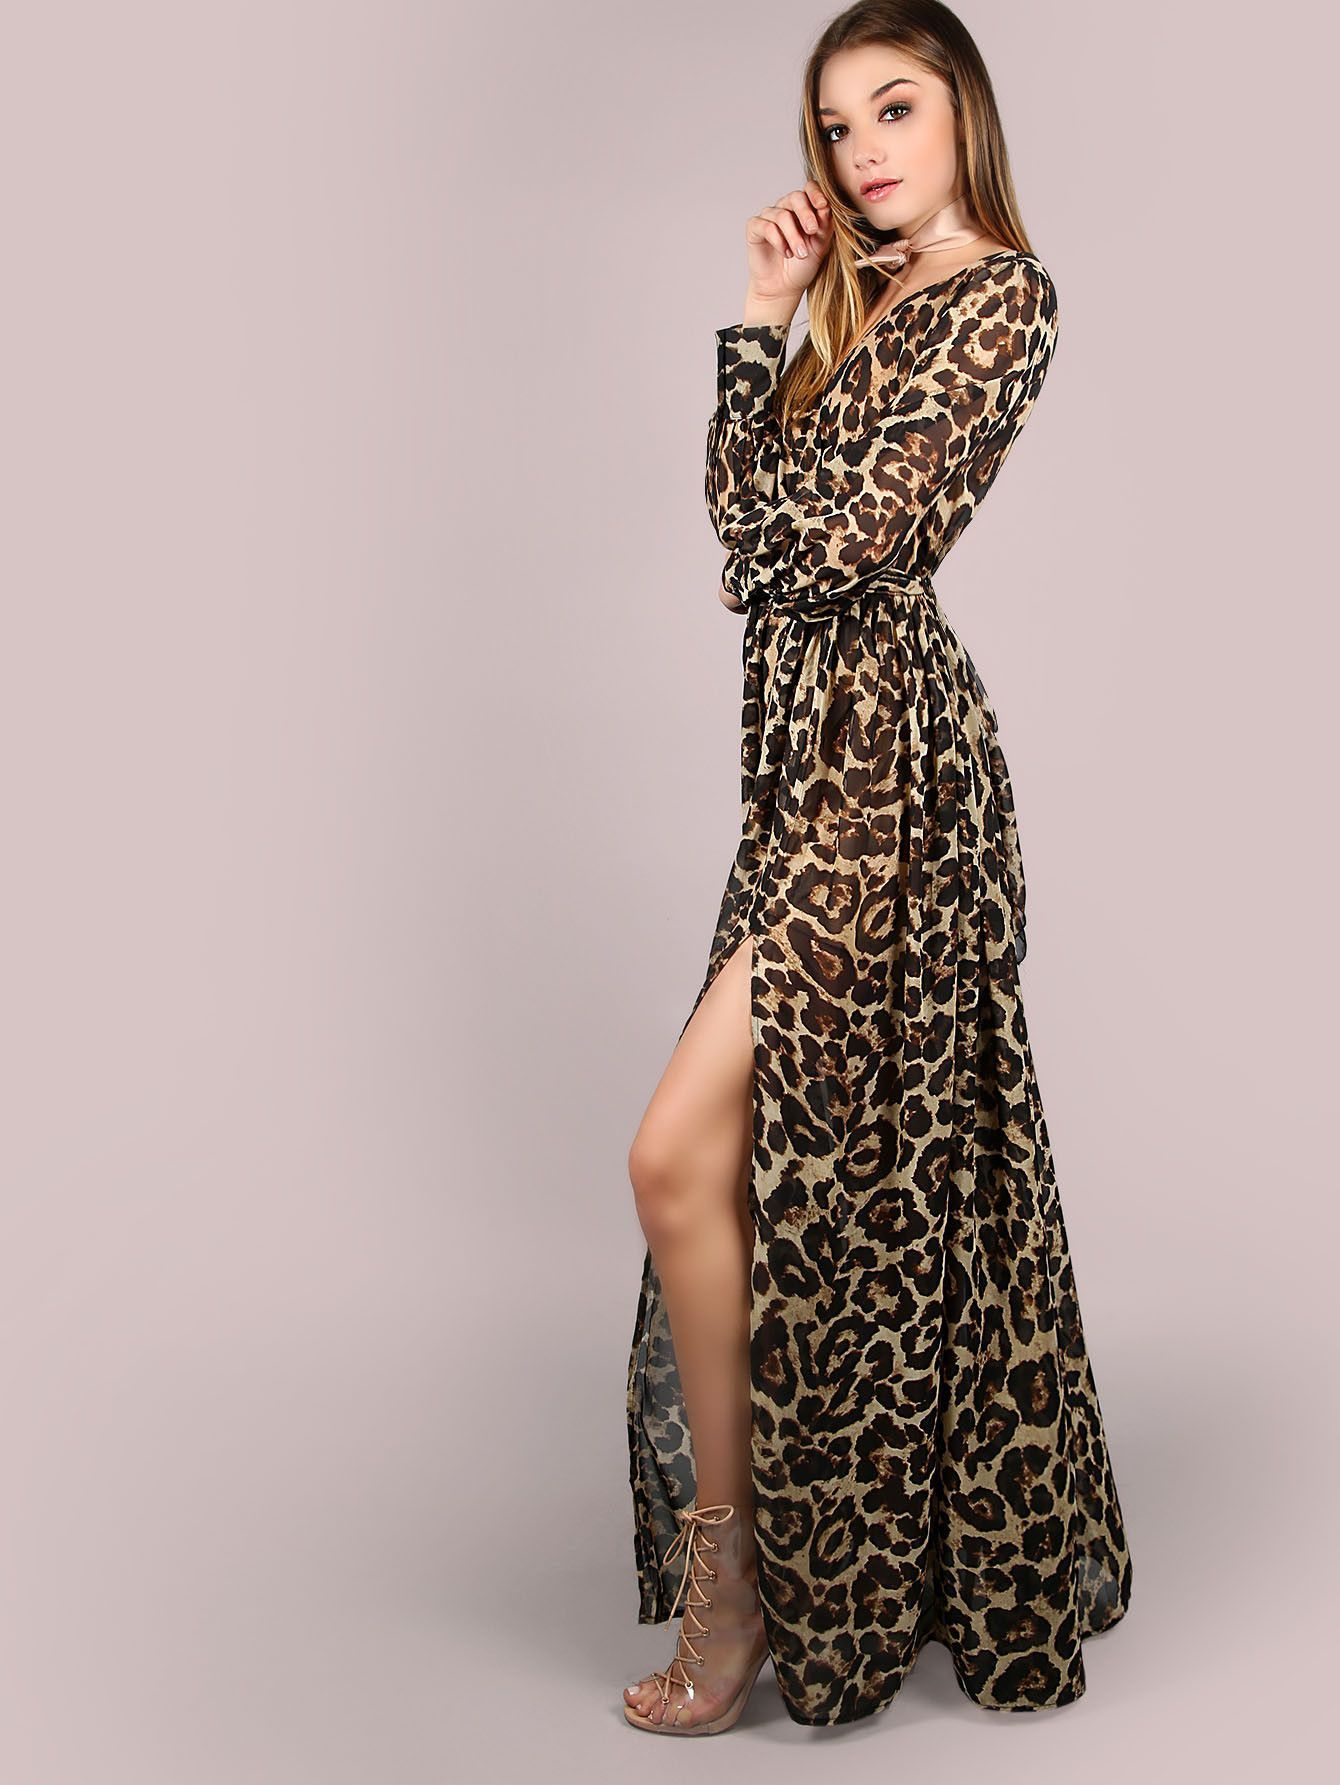 7f48c7b0e41 Brown Leopard Print Long Sleeve Chiffon Maxi Dress in 2019